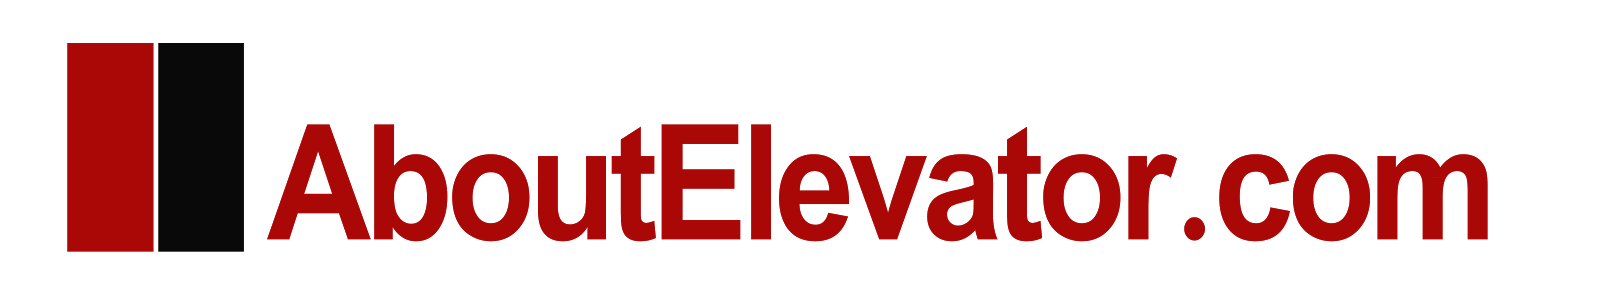 AboutElevator.com